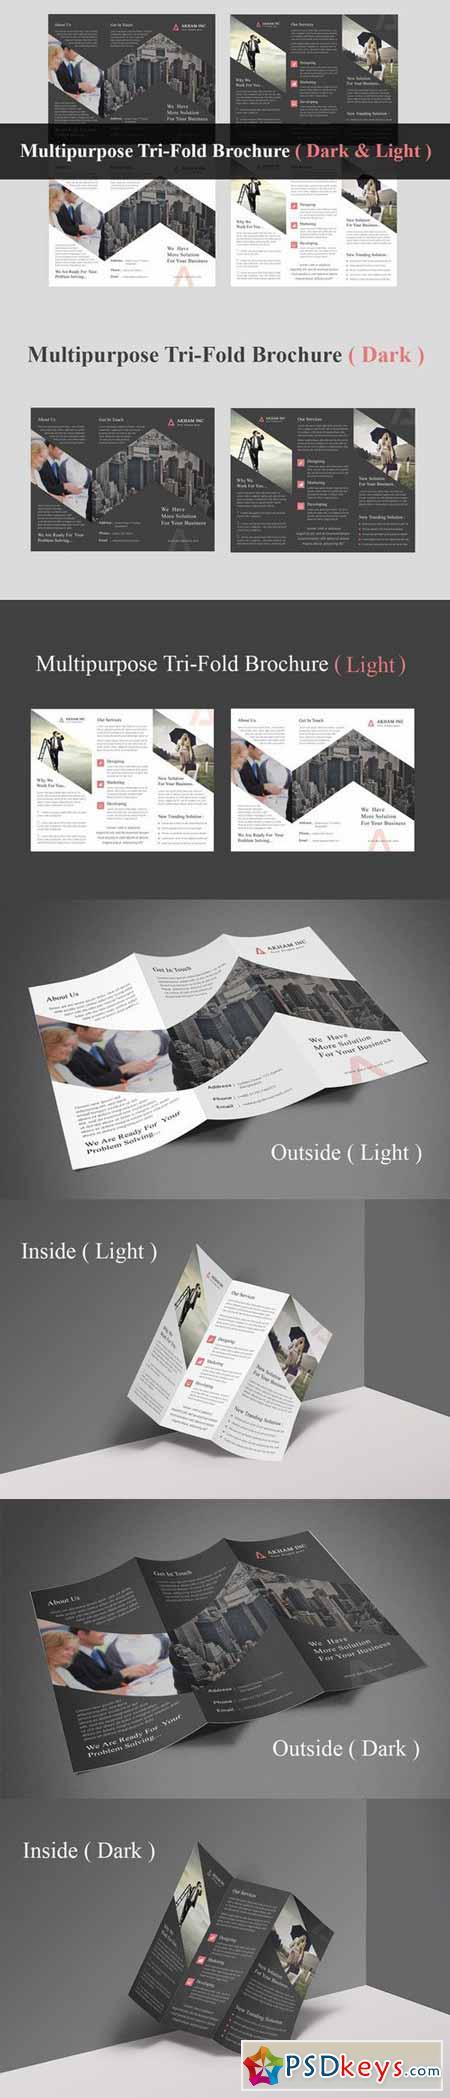 Multipurpose Tri-Fold Brochure 406449